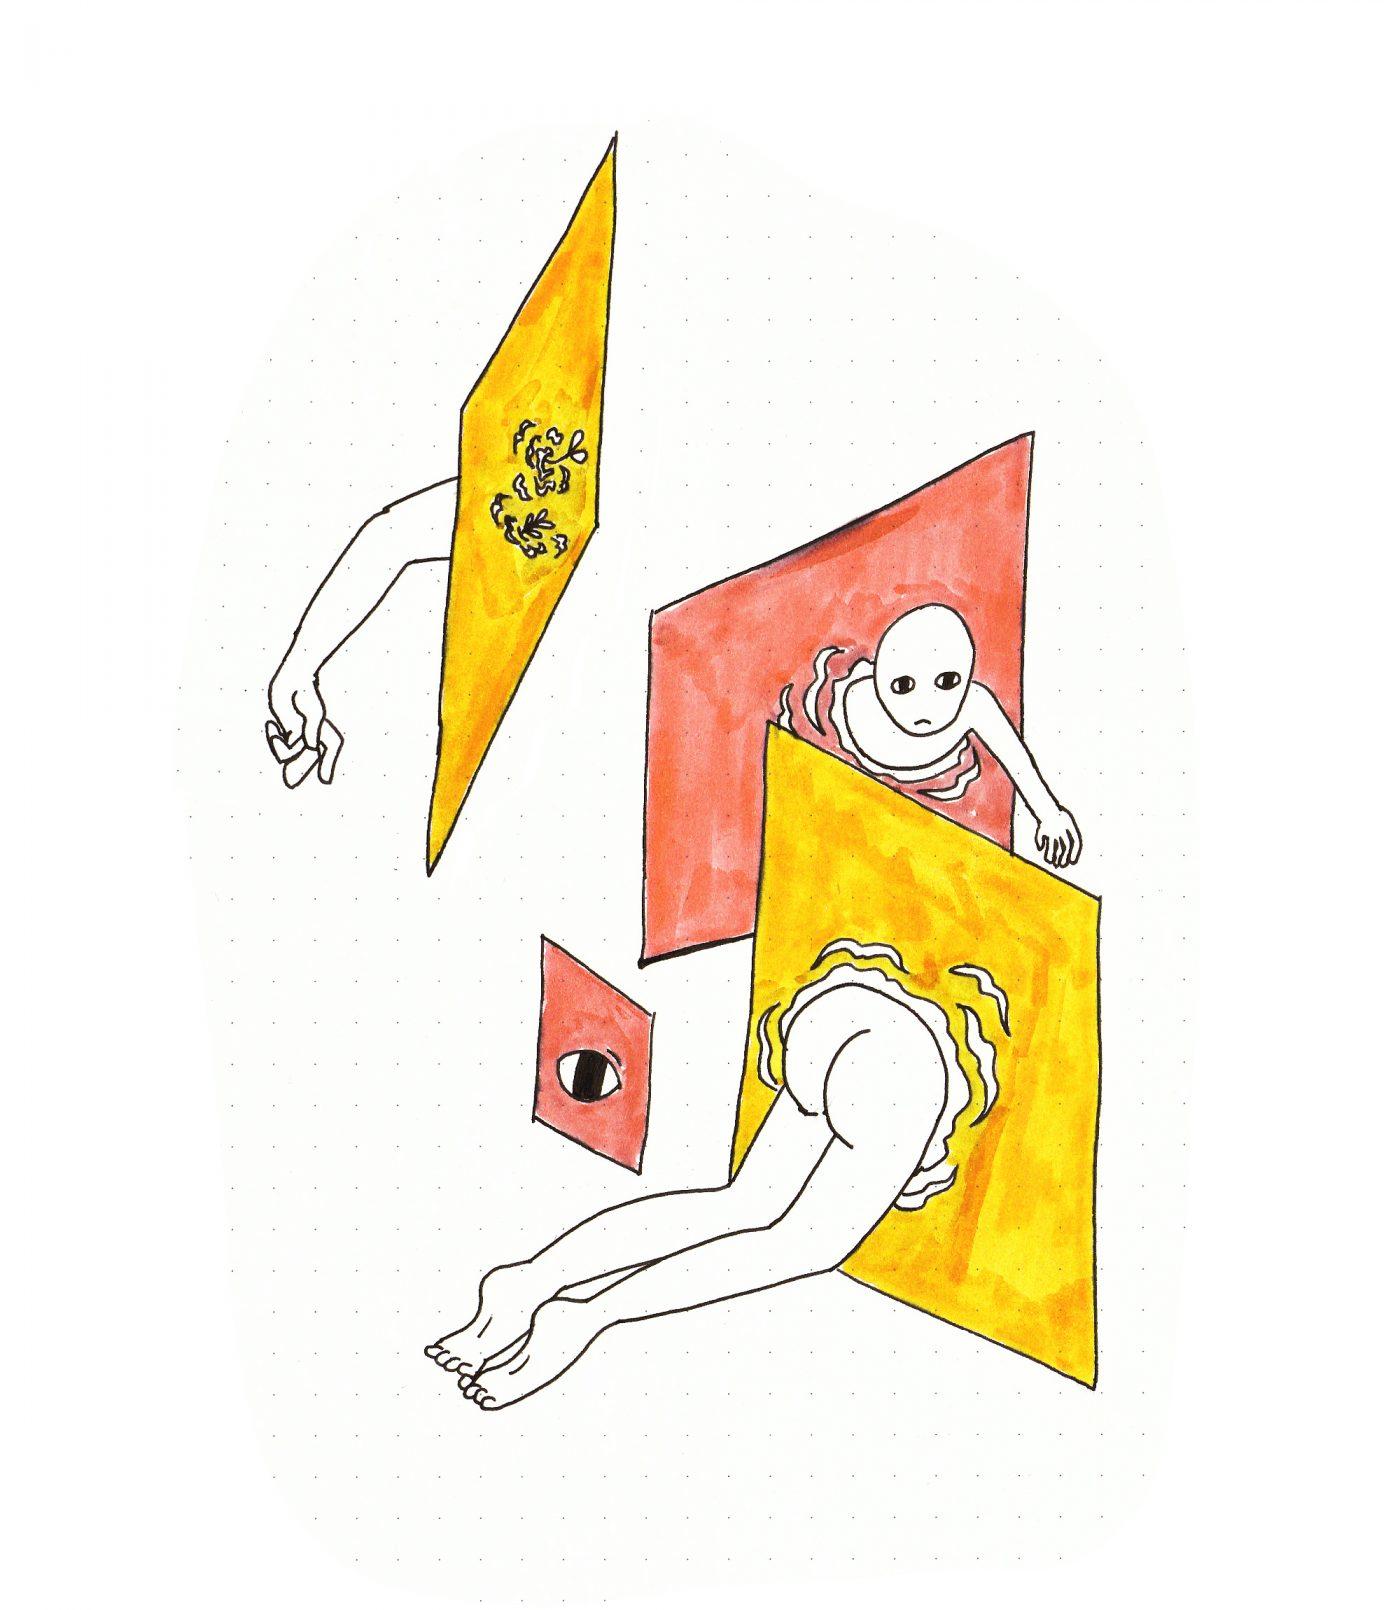 Nameless - Image 9 of 8